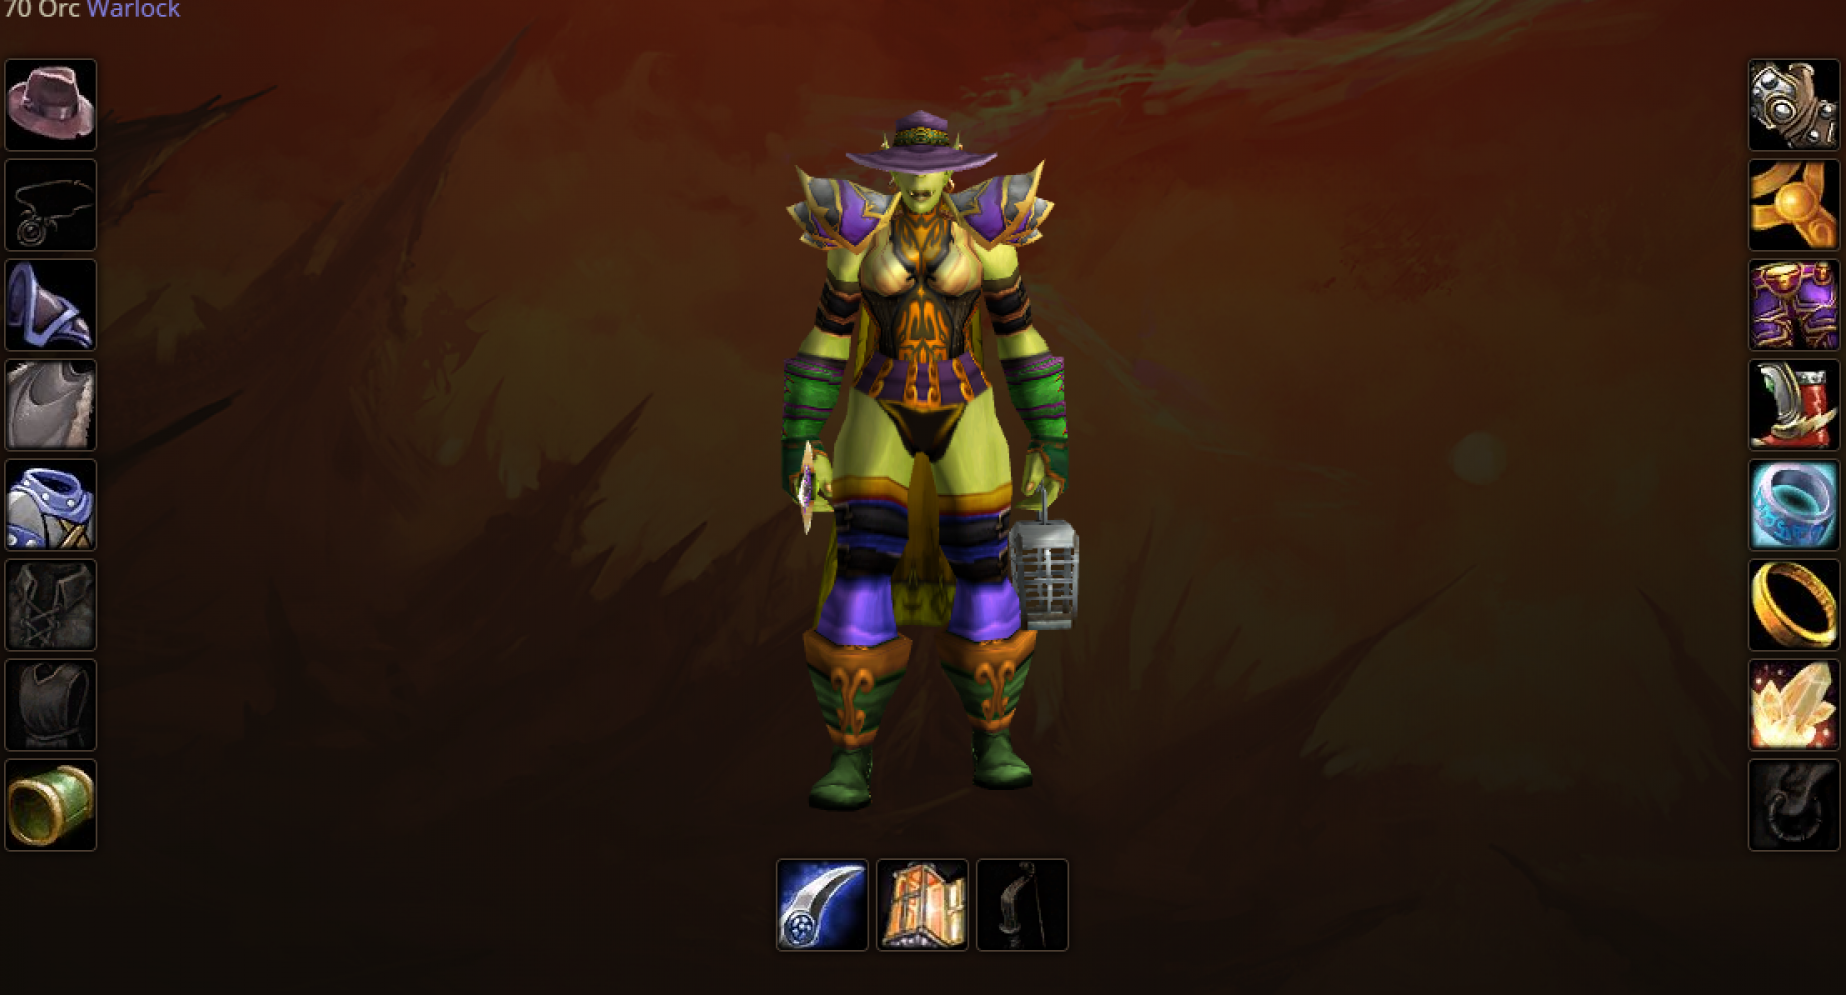 Orc female warlock windrunner